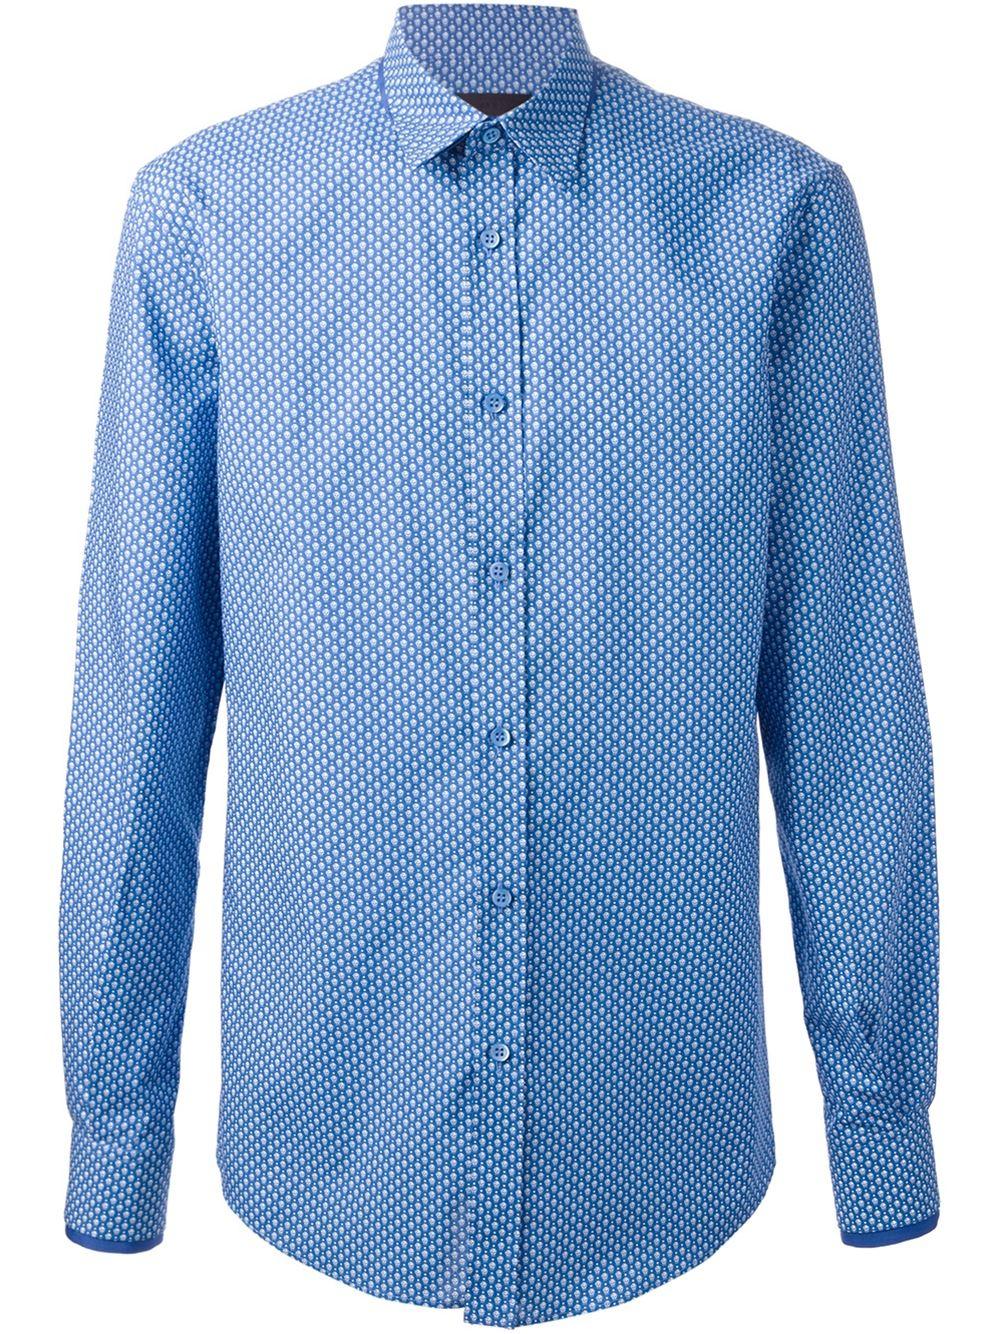 Alexander mcqueen skull print shirt in blue for men lyst for Alexander mcqueen shirt men